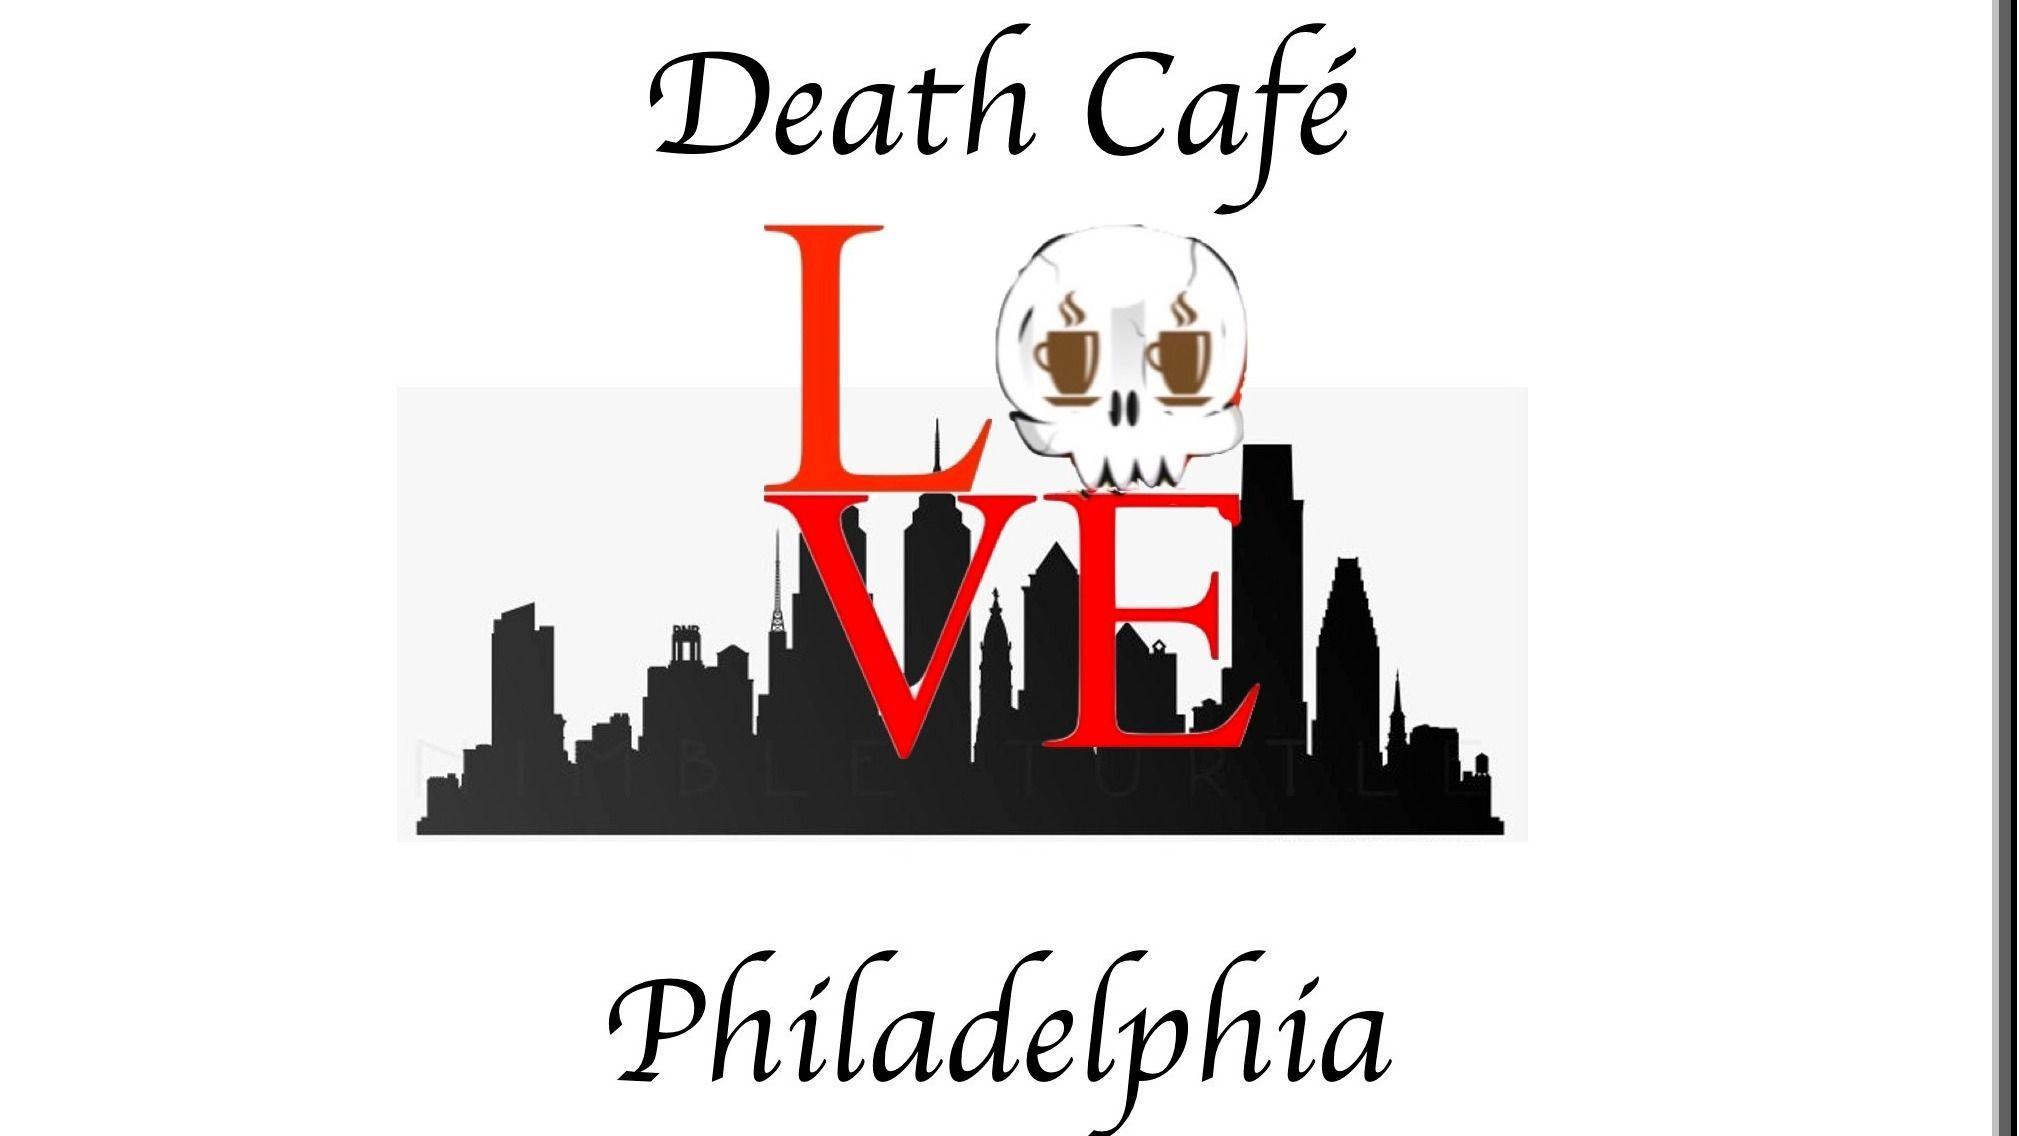 Death Cafe Philadelphia and Greater Philadelphia